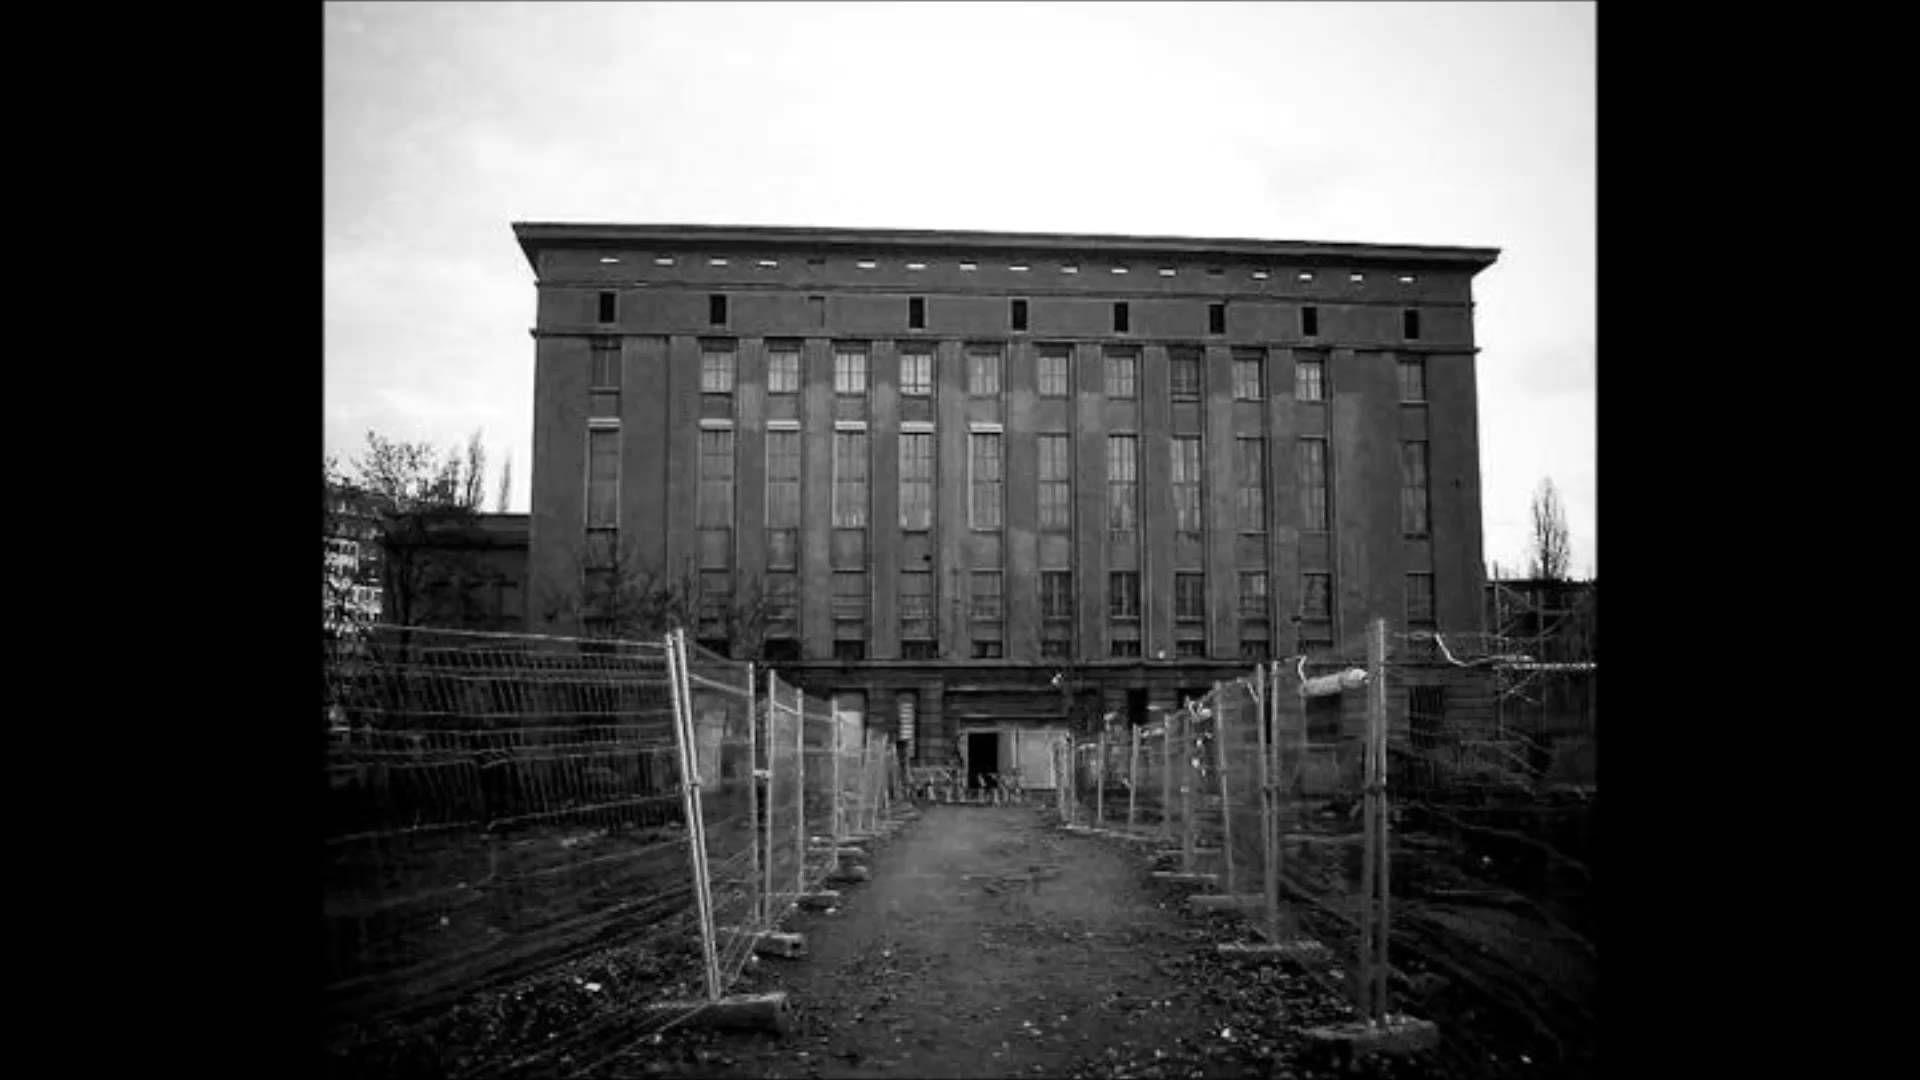 Krashkee - The Berghain Project [full dj set] // dark techno